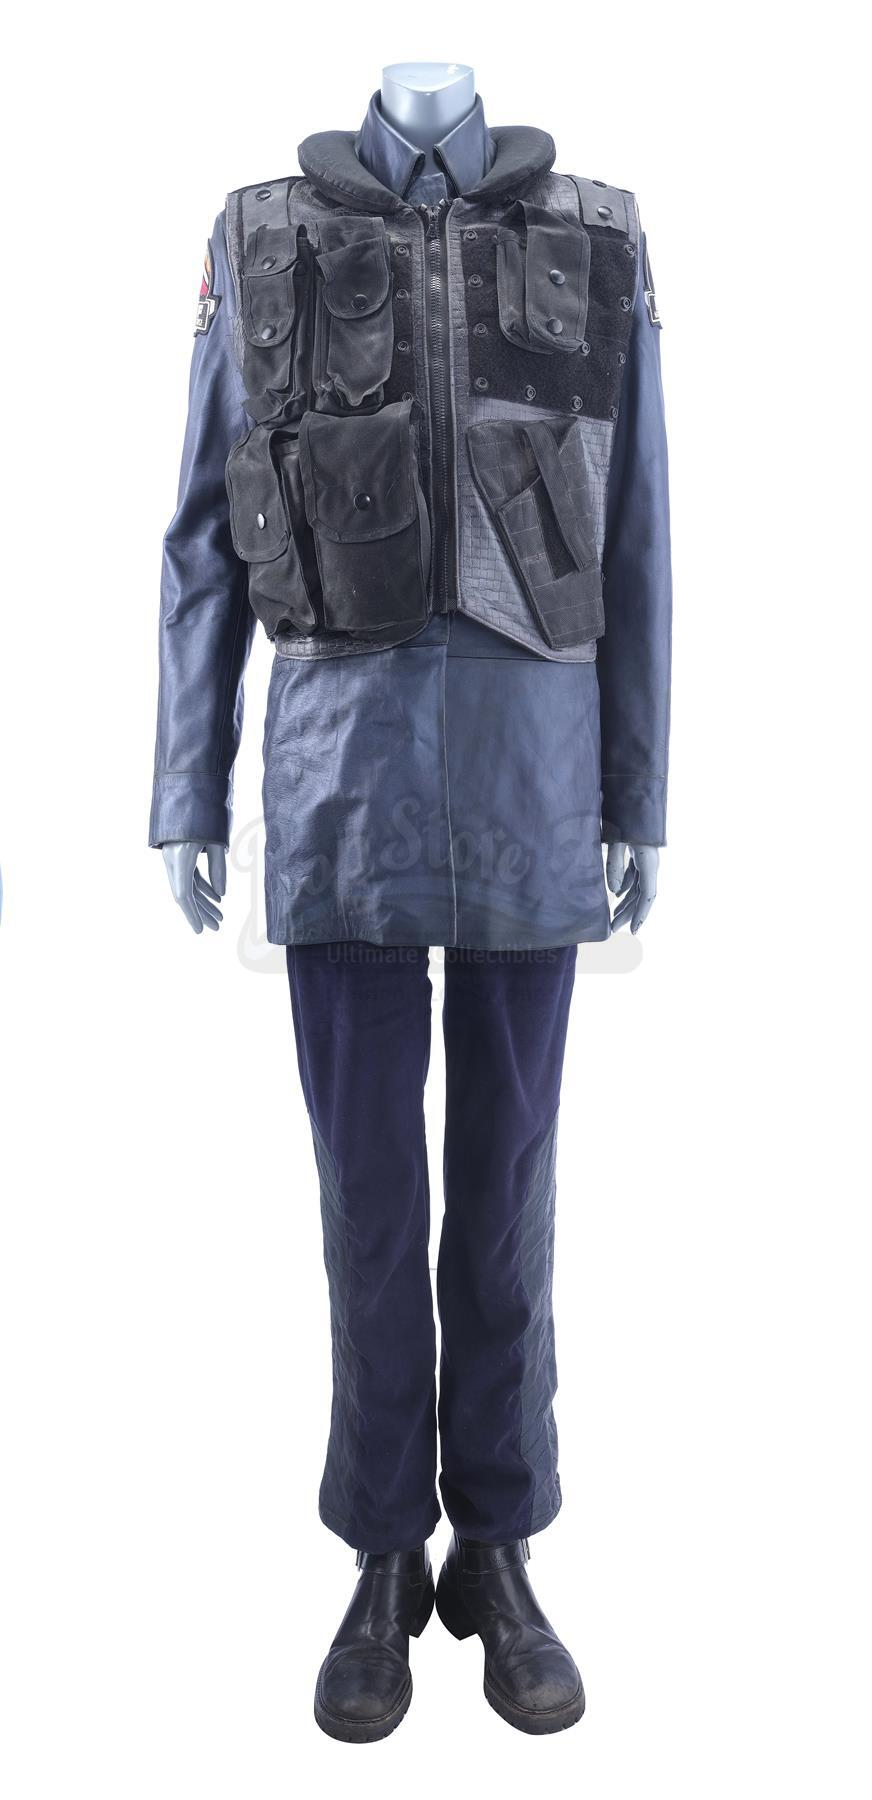 Lot # 697: JOHN CARPENTER'S GHOSTS OF MARS - Bashira Kincaid's (Clea DuVall) Costume